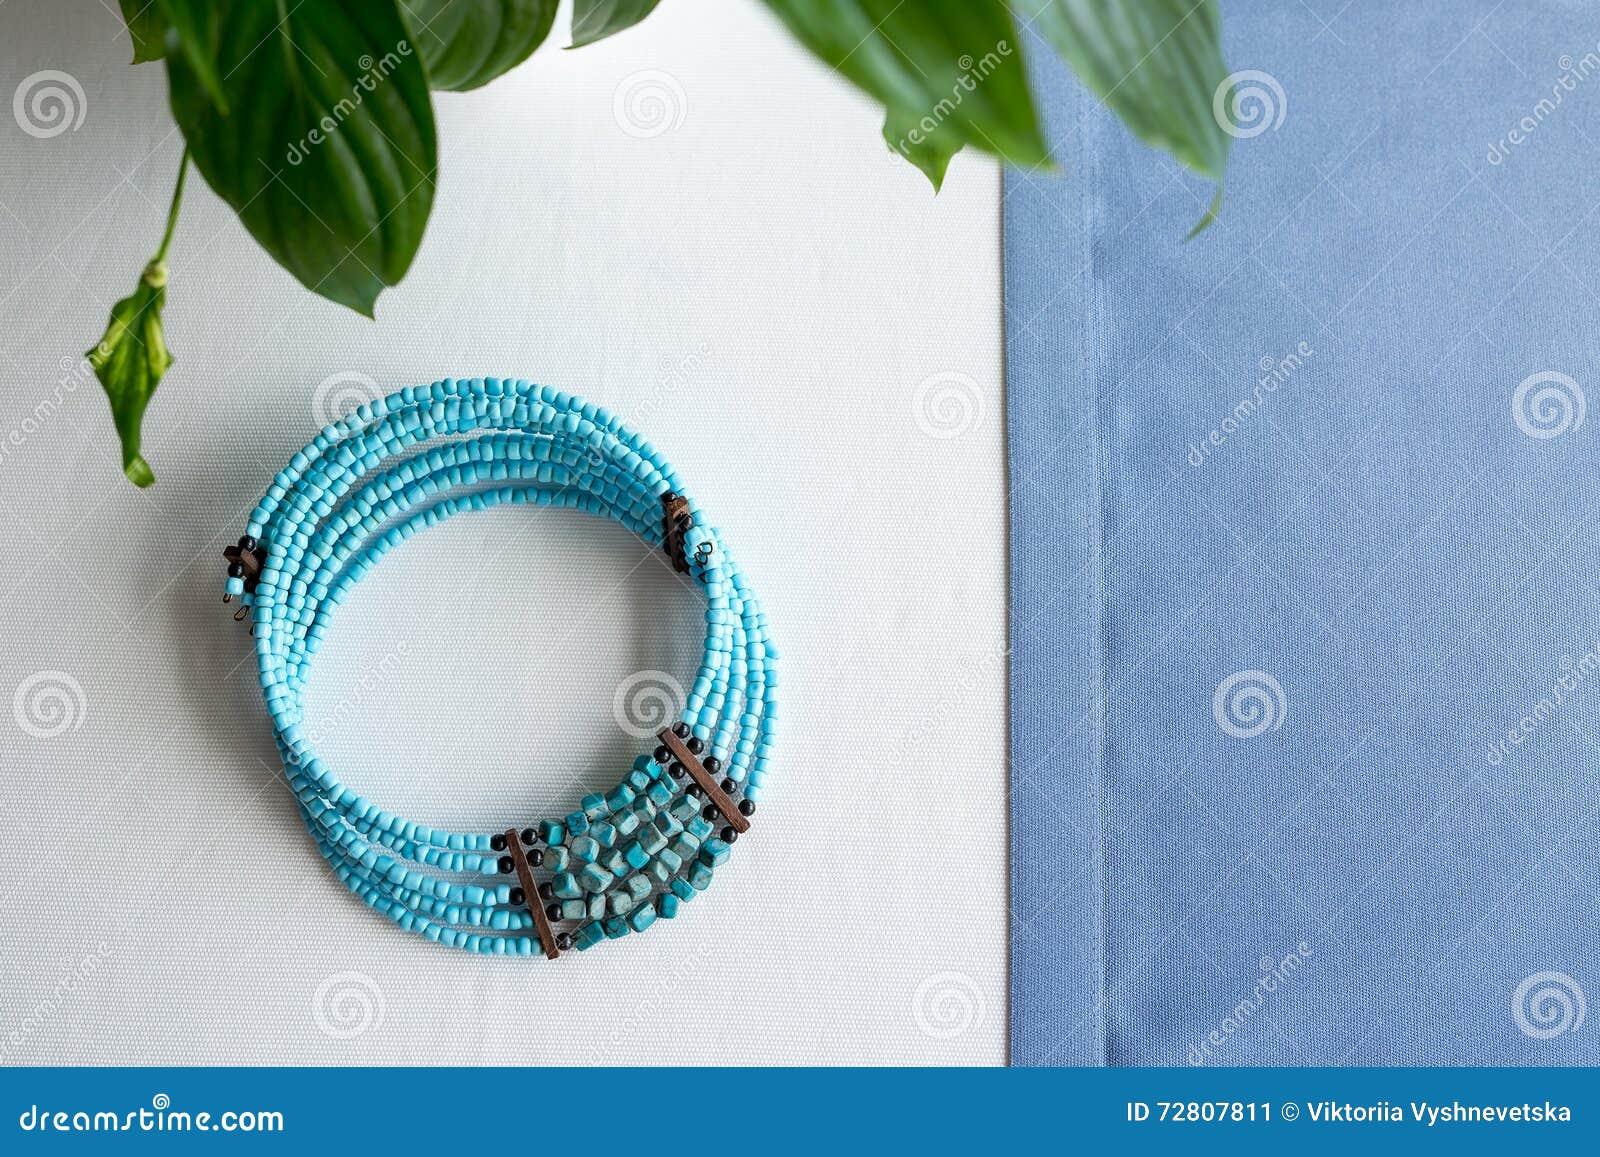 Камни бело голубого цвета